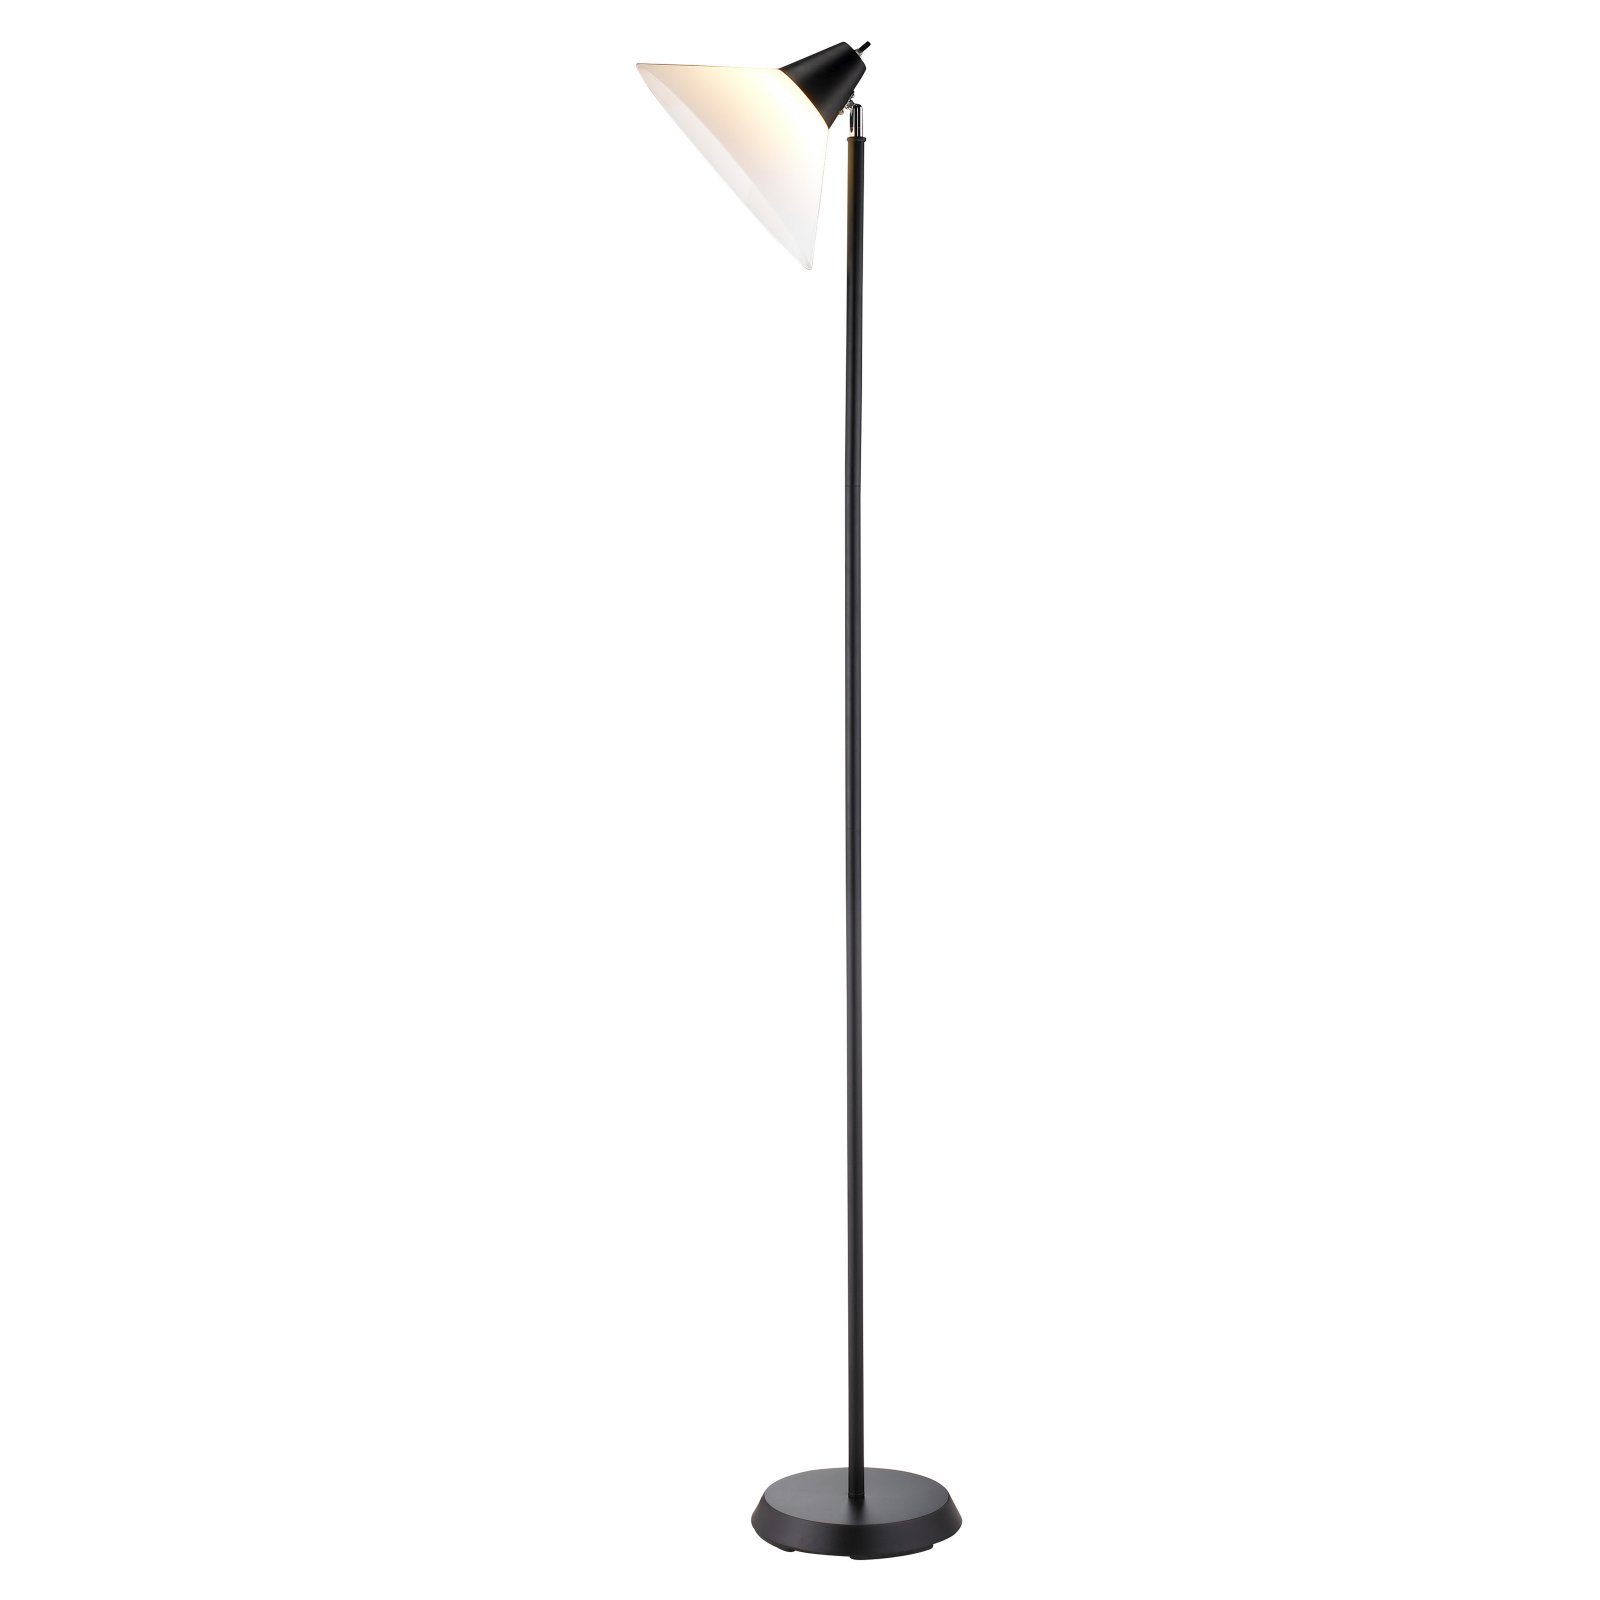 Adesso Swivel Floor Lamp